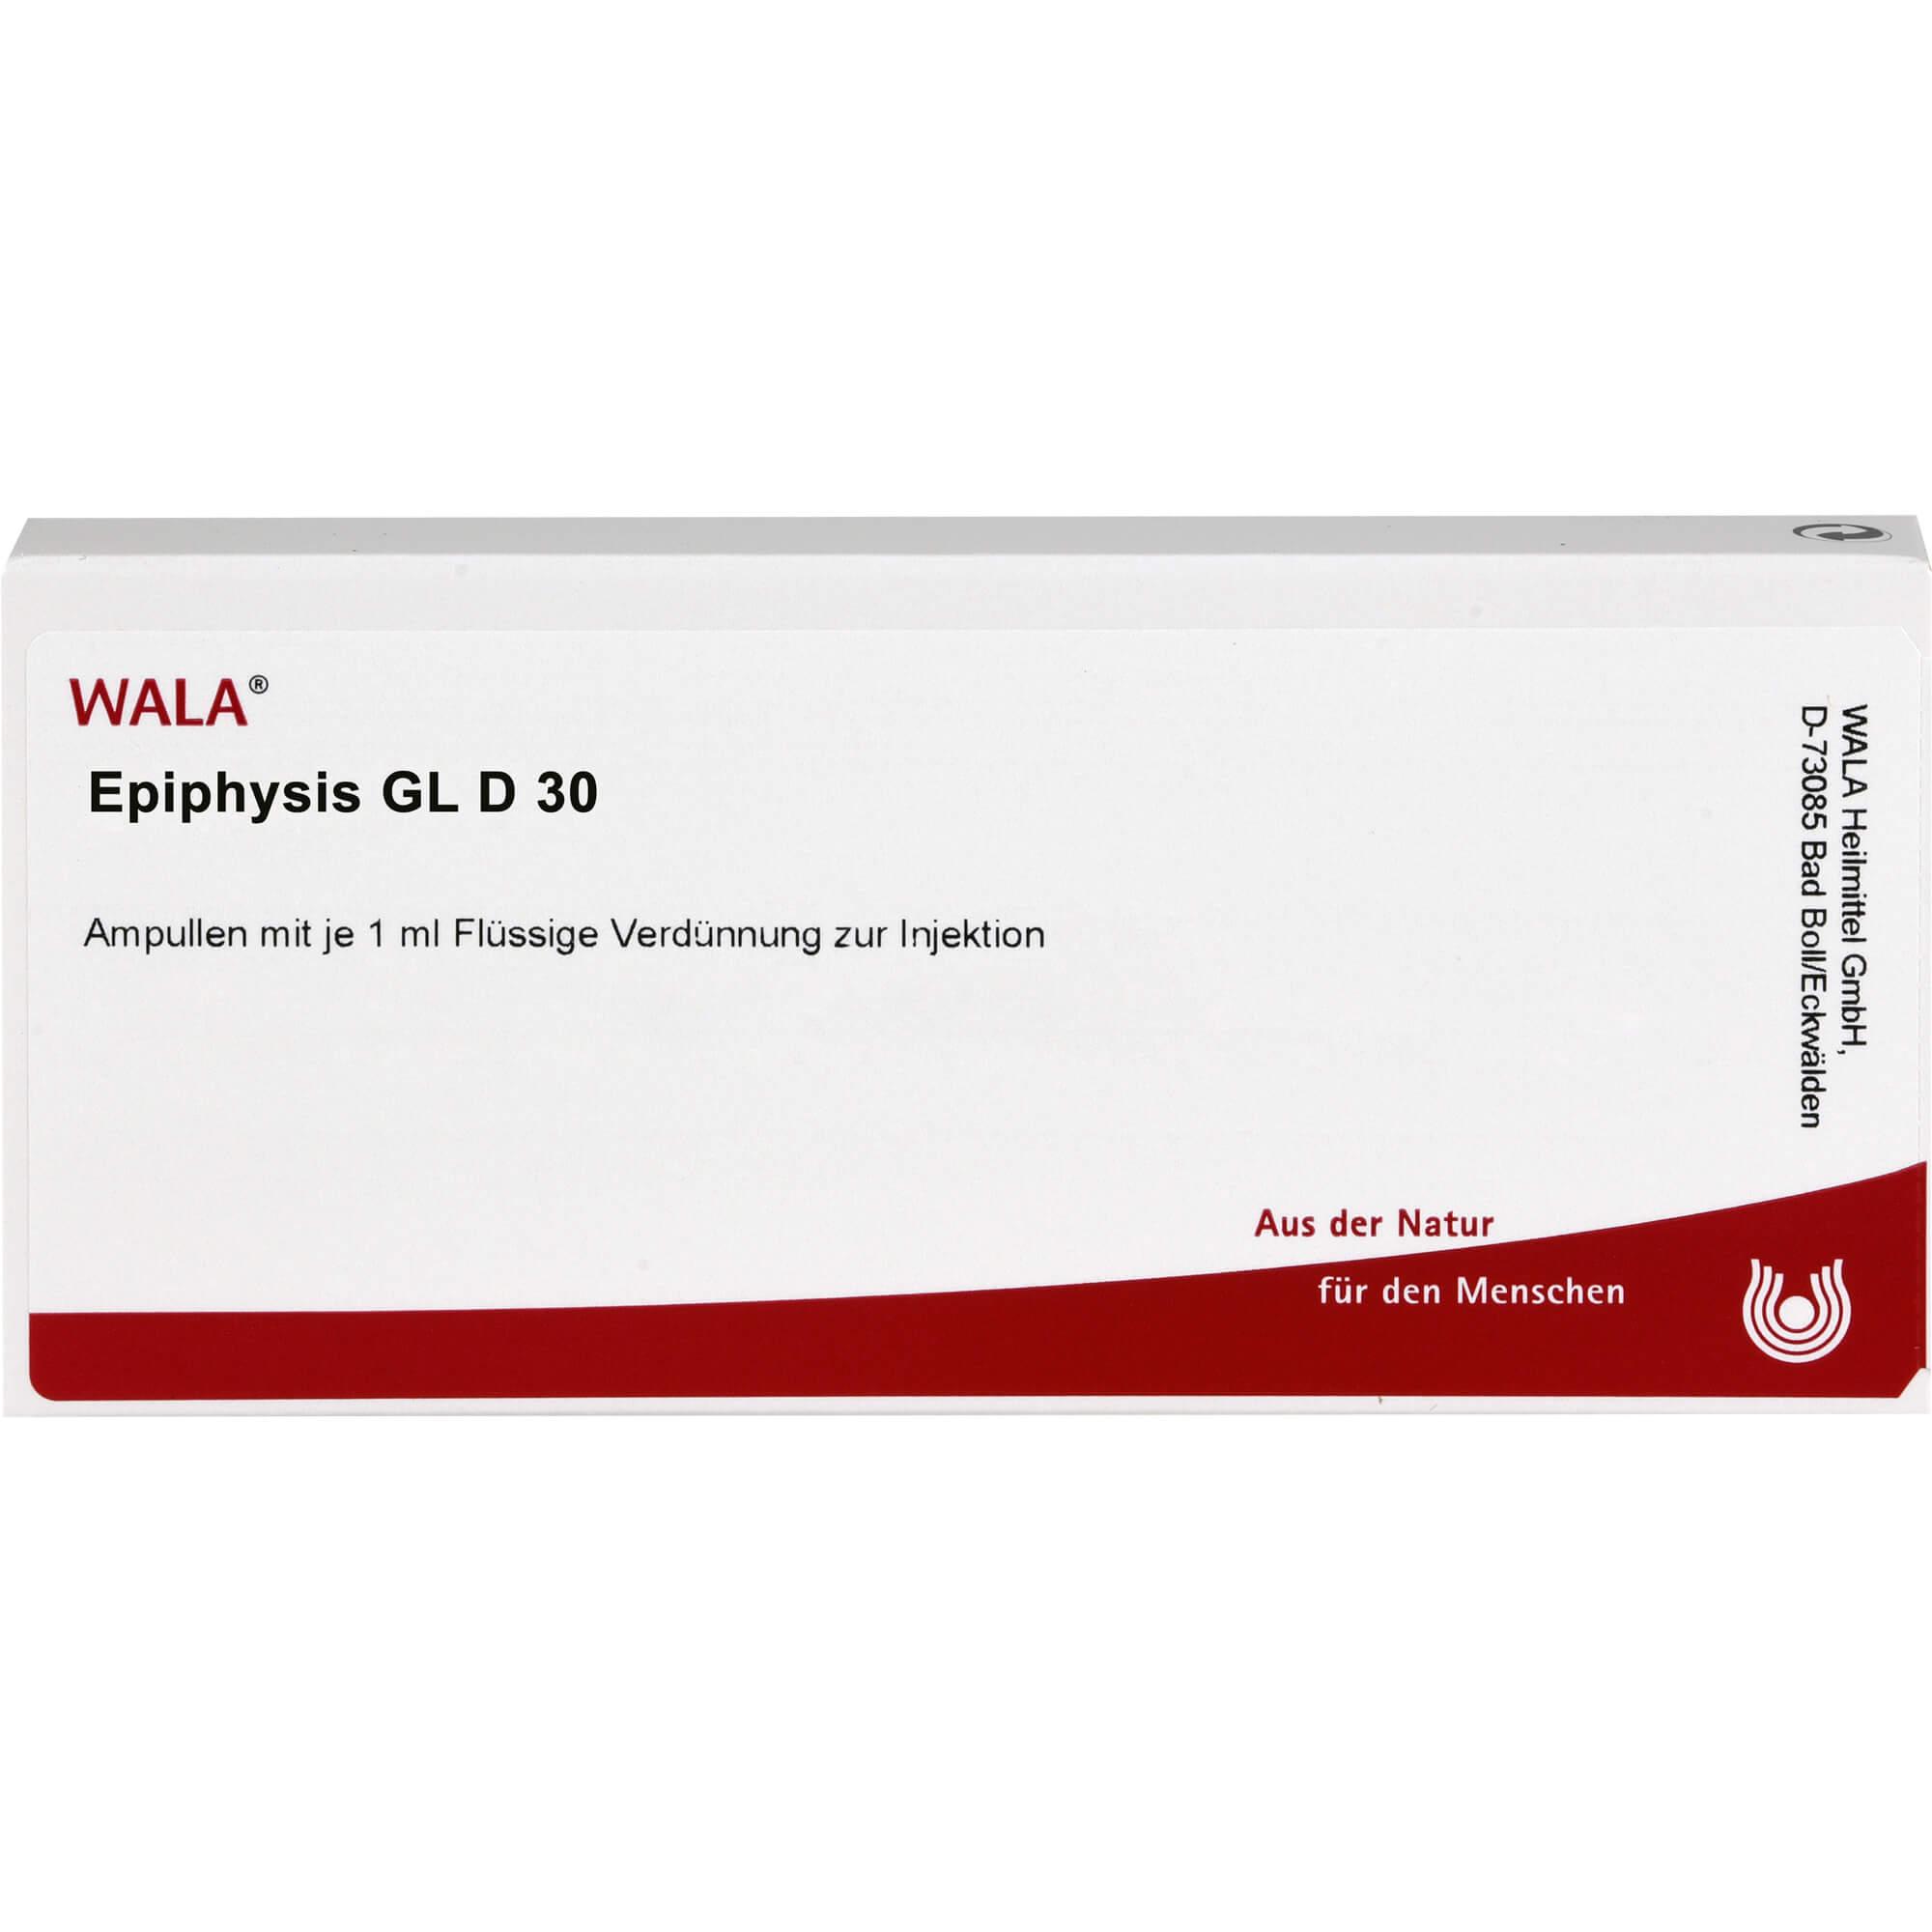 EPIPHYSIS-GL-D-30-Ampullen